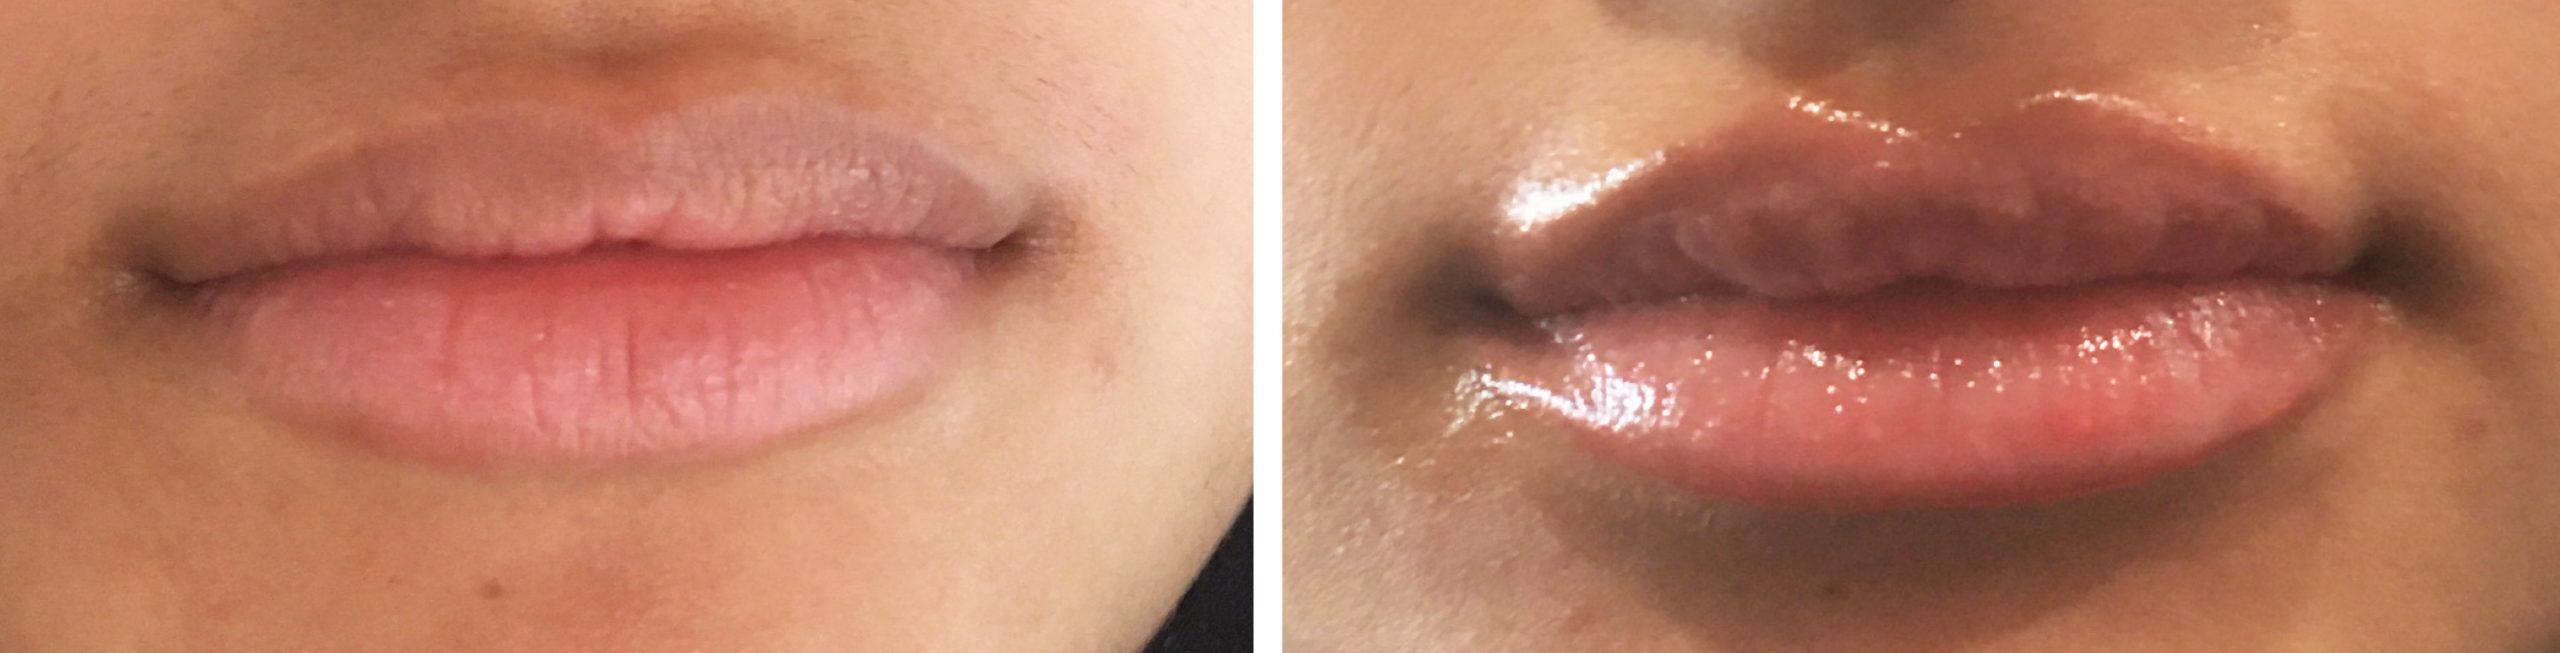 Permanent Lip Color - ABG Wellness - Chandler AZ